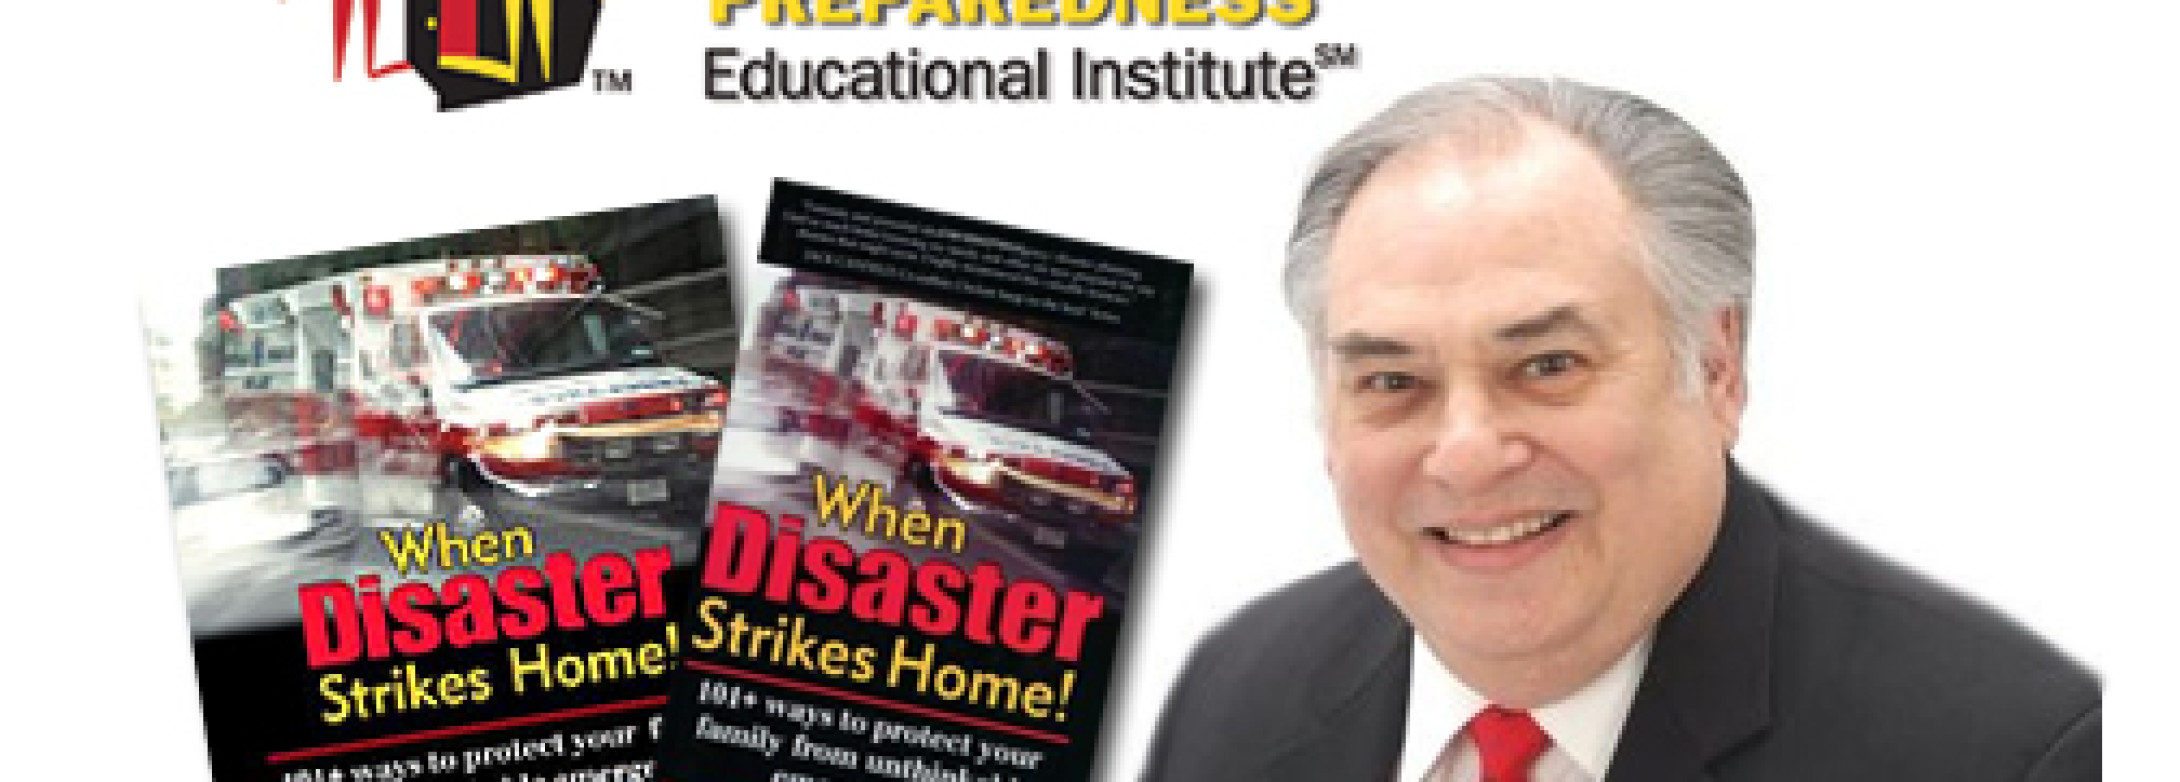 Emergency Preparedness Educational Institute